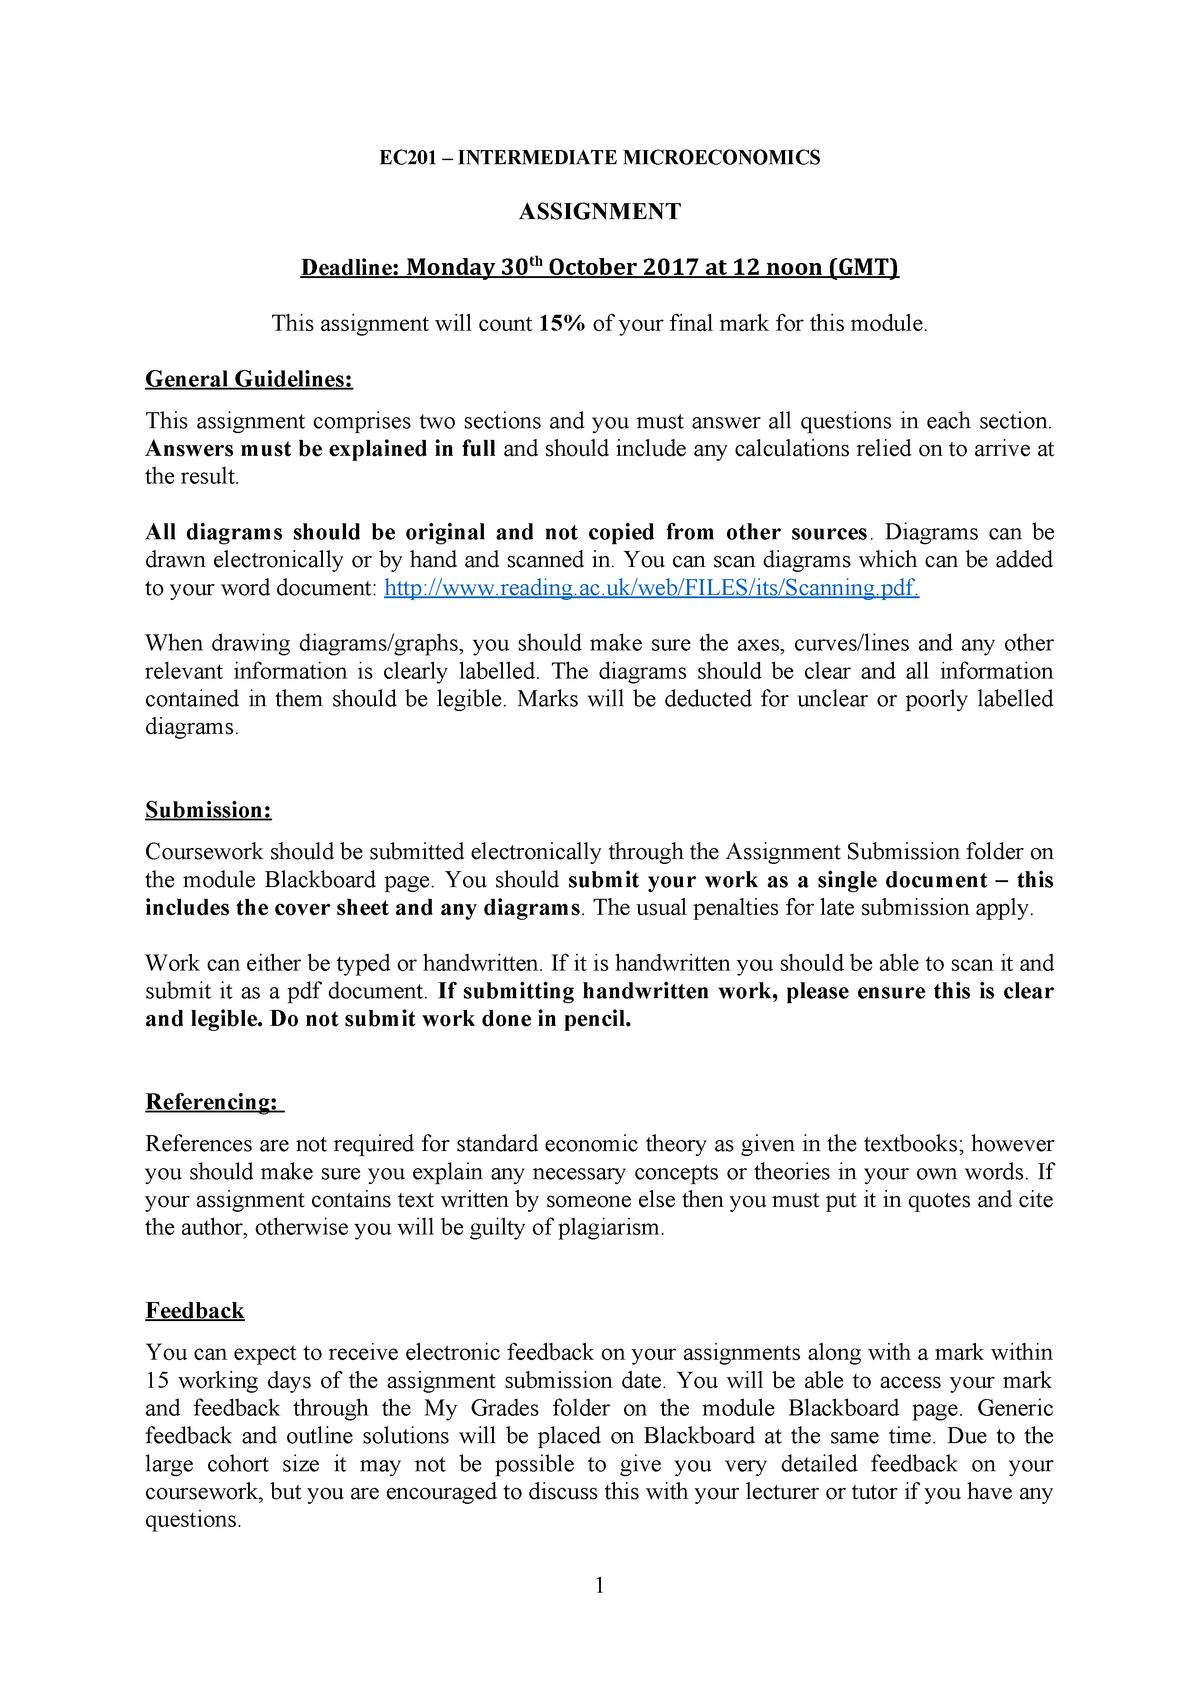 EC201 Assignment - EC201: Intermediate Microeconomics - StuDocu